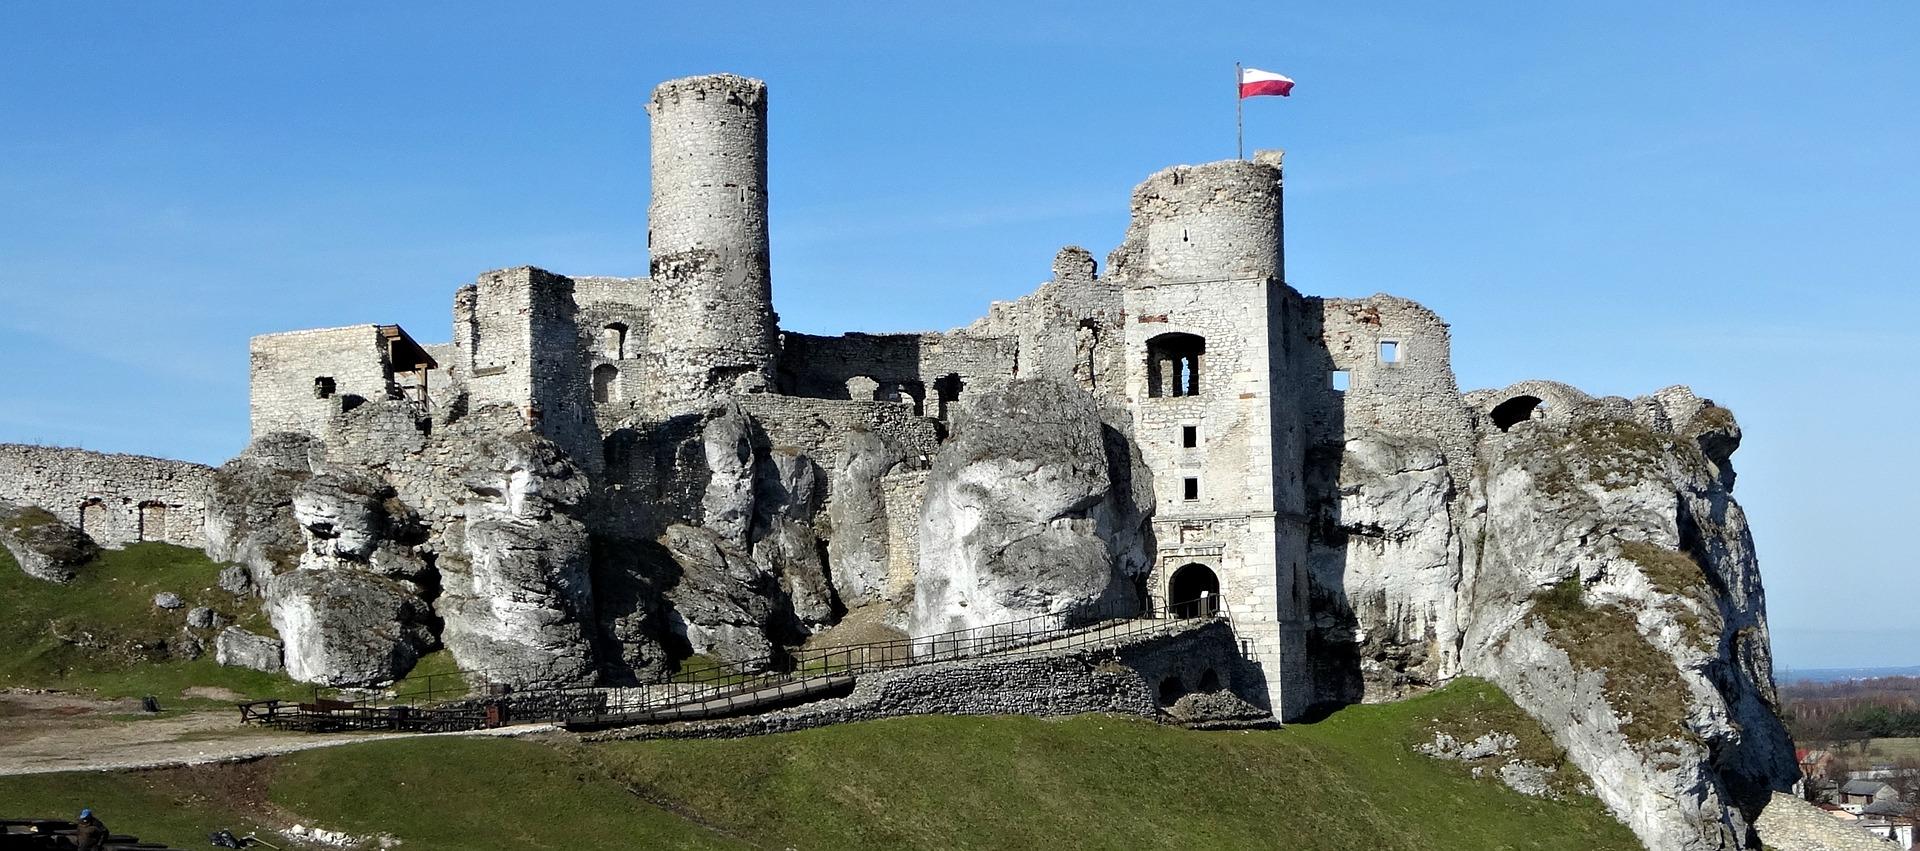 Castello di Ogrodzieniec